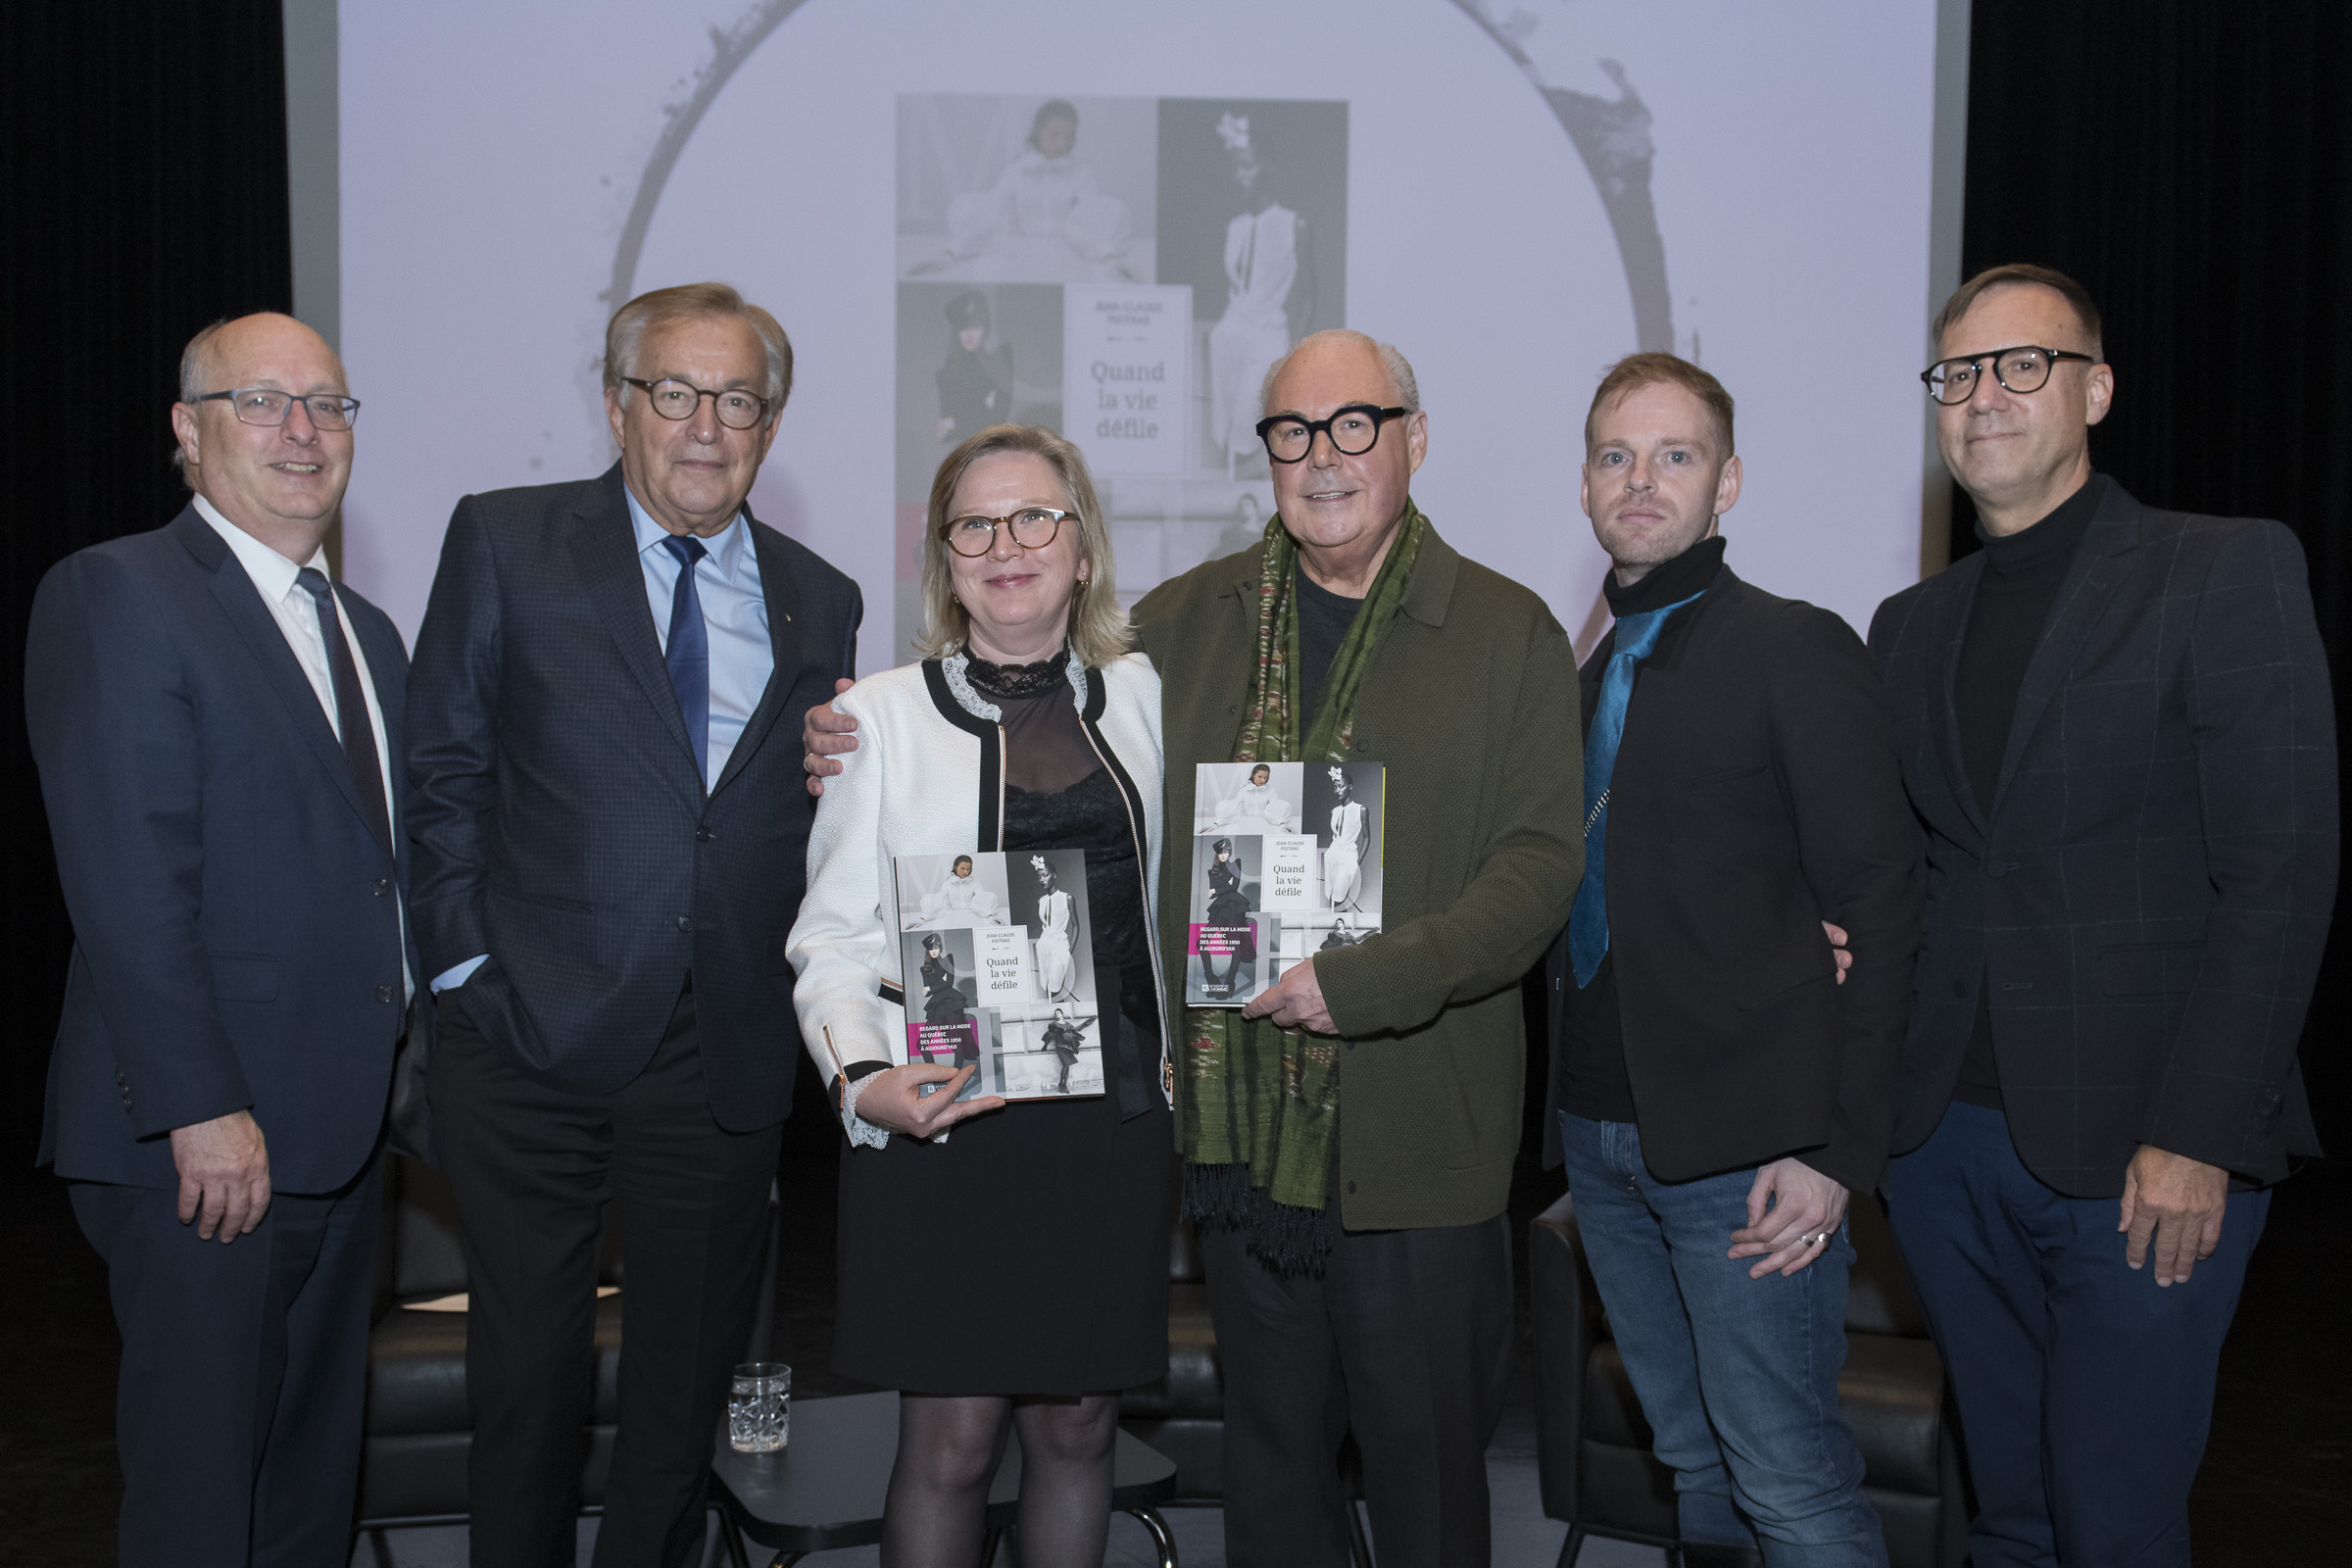 01 Media_076_Conference-lancement_Jean-Claude_Poitras_2018_10_29.jpg